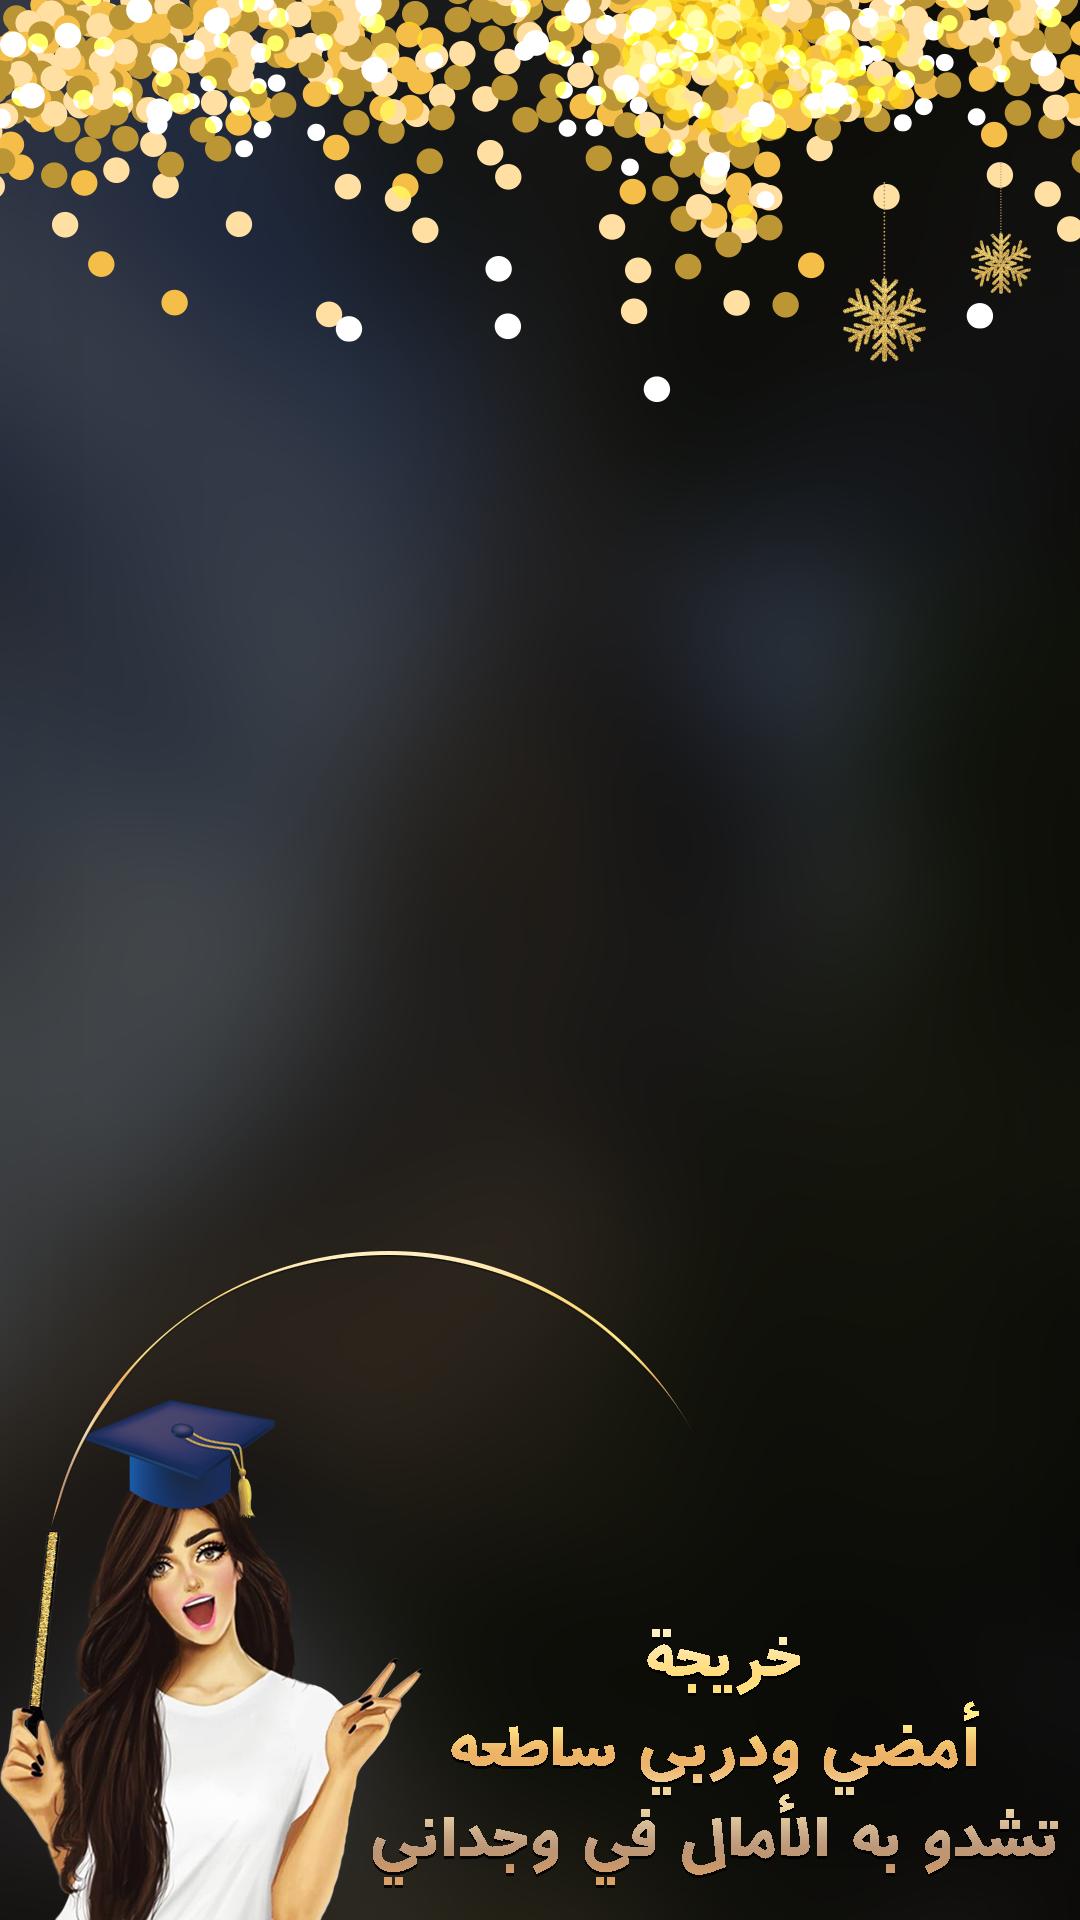 فلتر تخرج احترافي لعام 2018 لتصميم فلاتر سناب شات فلتر تخرج فلاتر فلتر خاص فلتر زواج فلتر مواليد فلاتر Graduation Wallpaper Graduation Art Graduation Diy